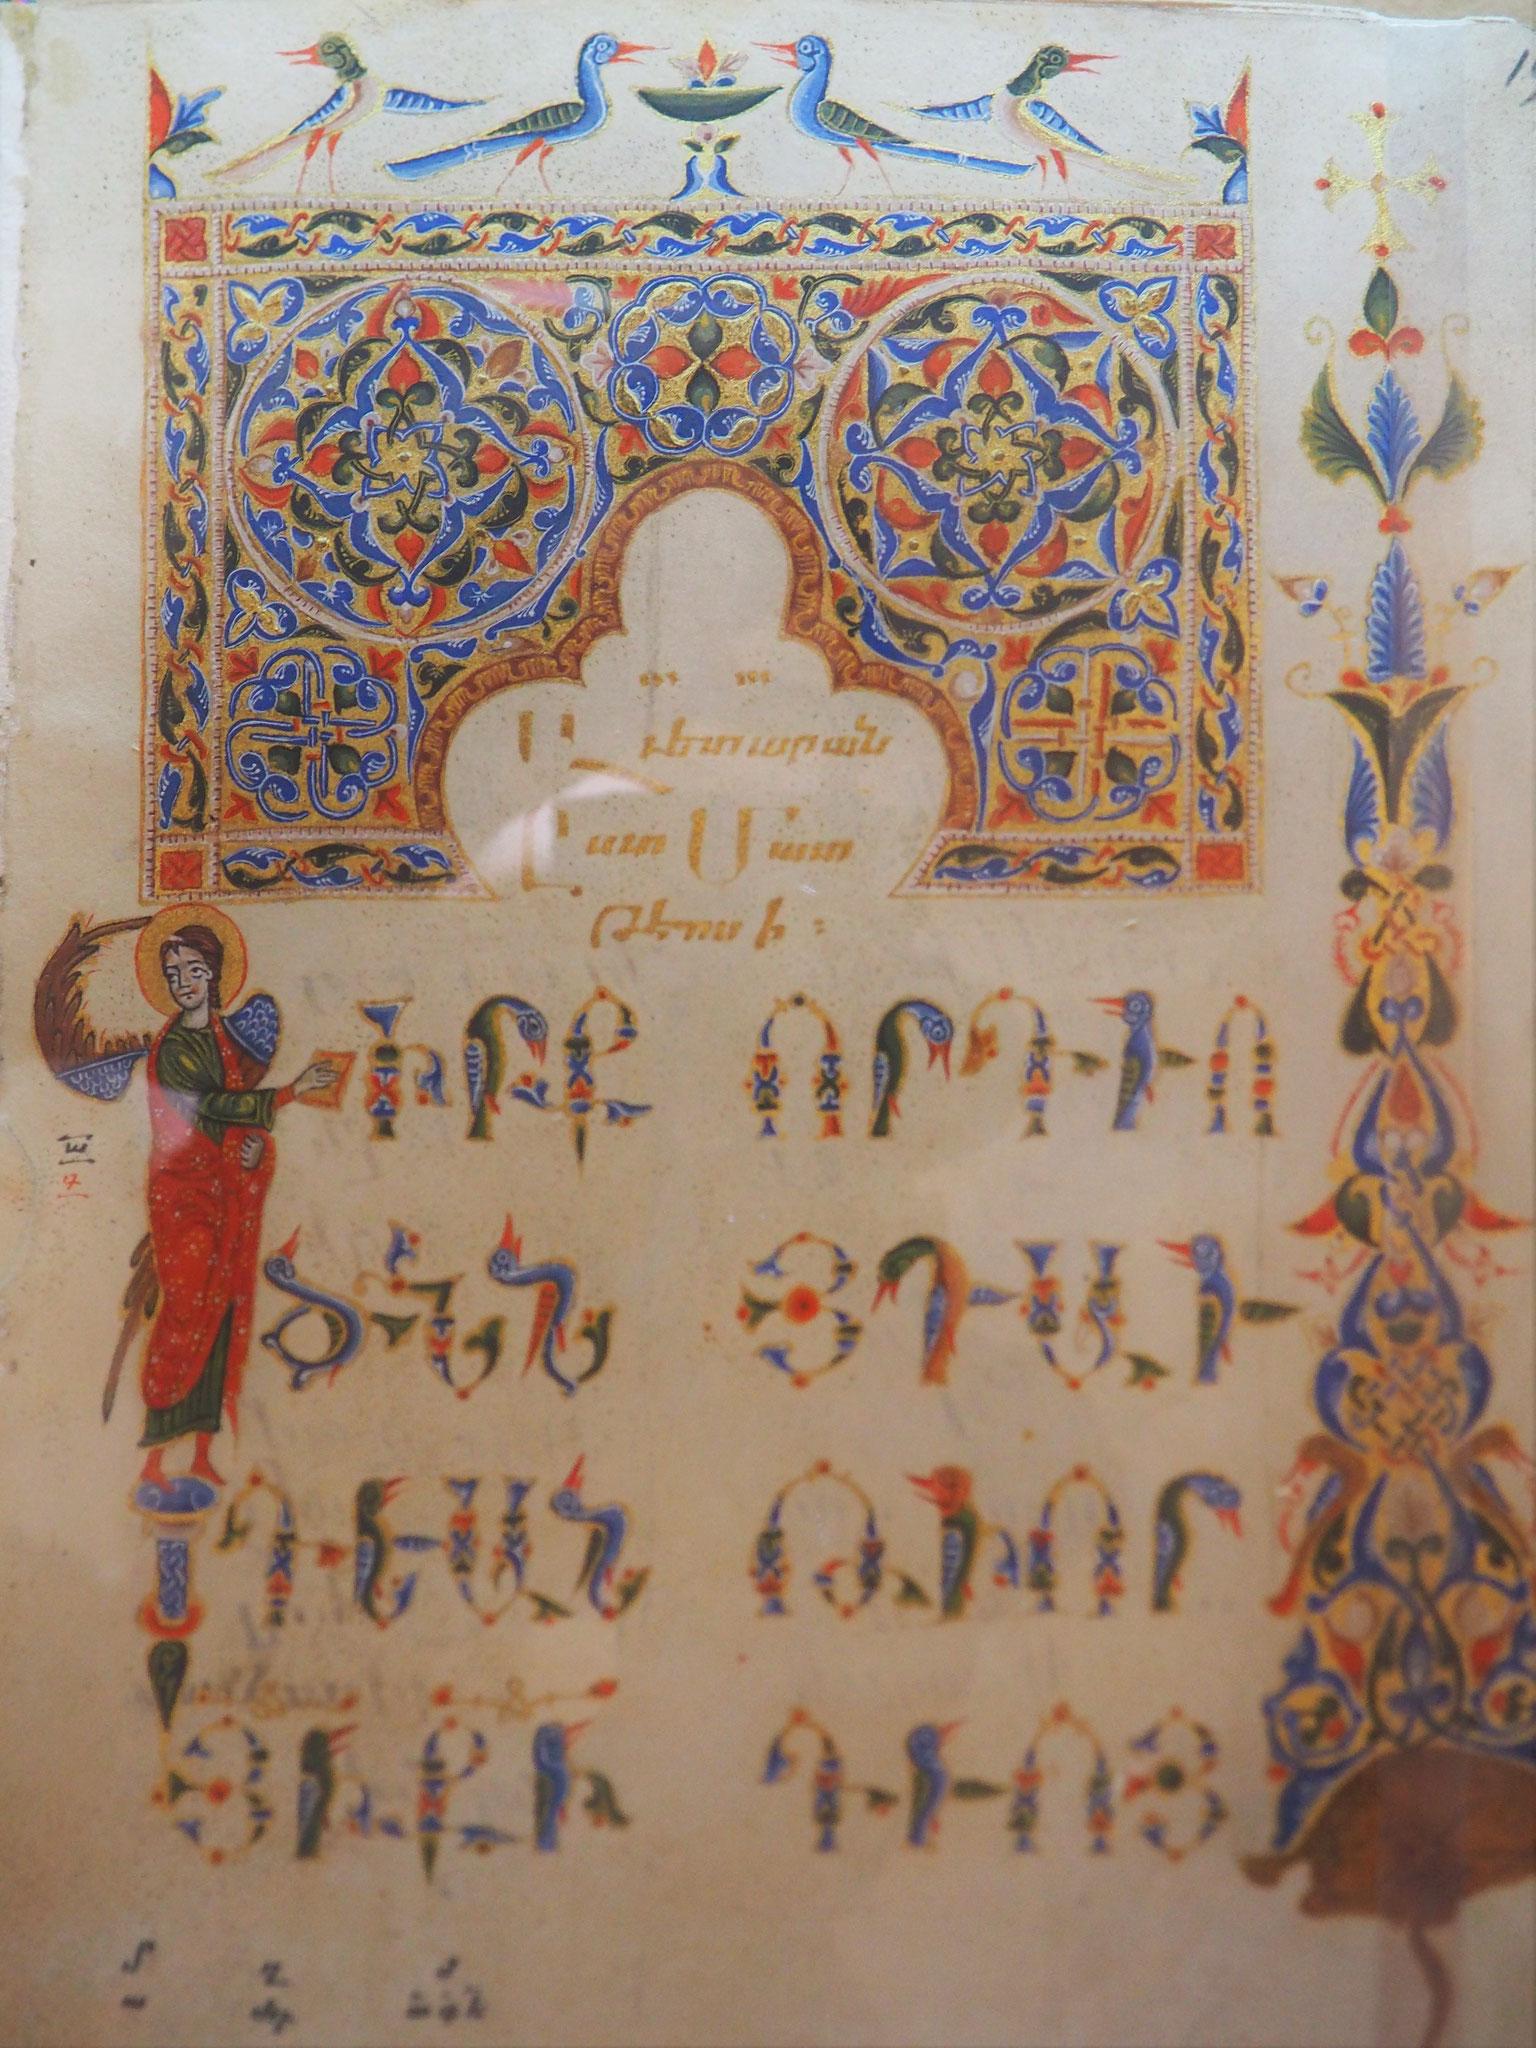 Im Handschriftenmuseum (Matenadaran)